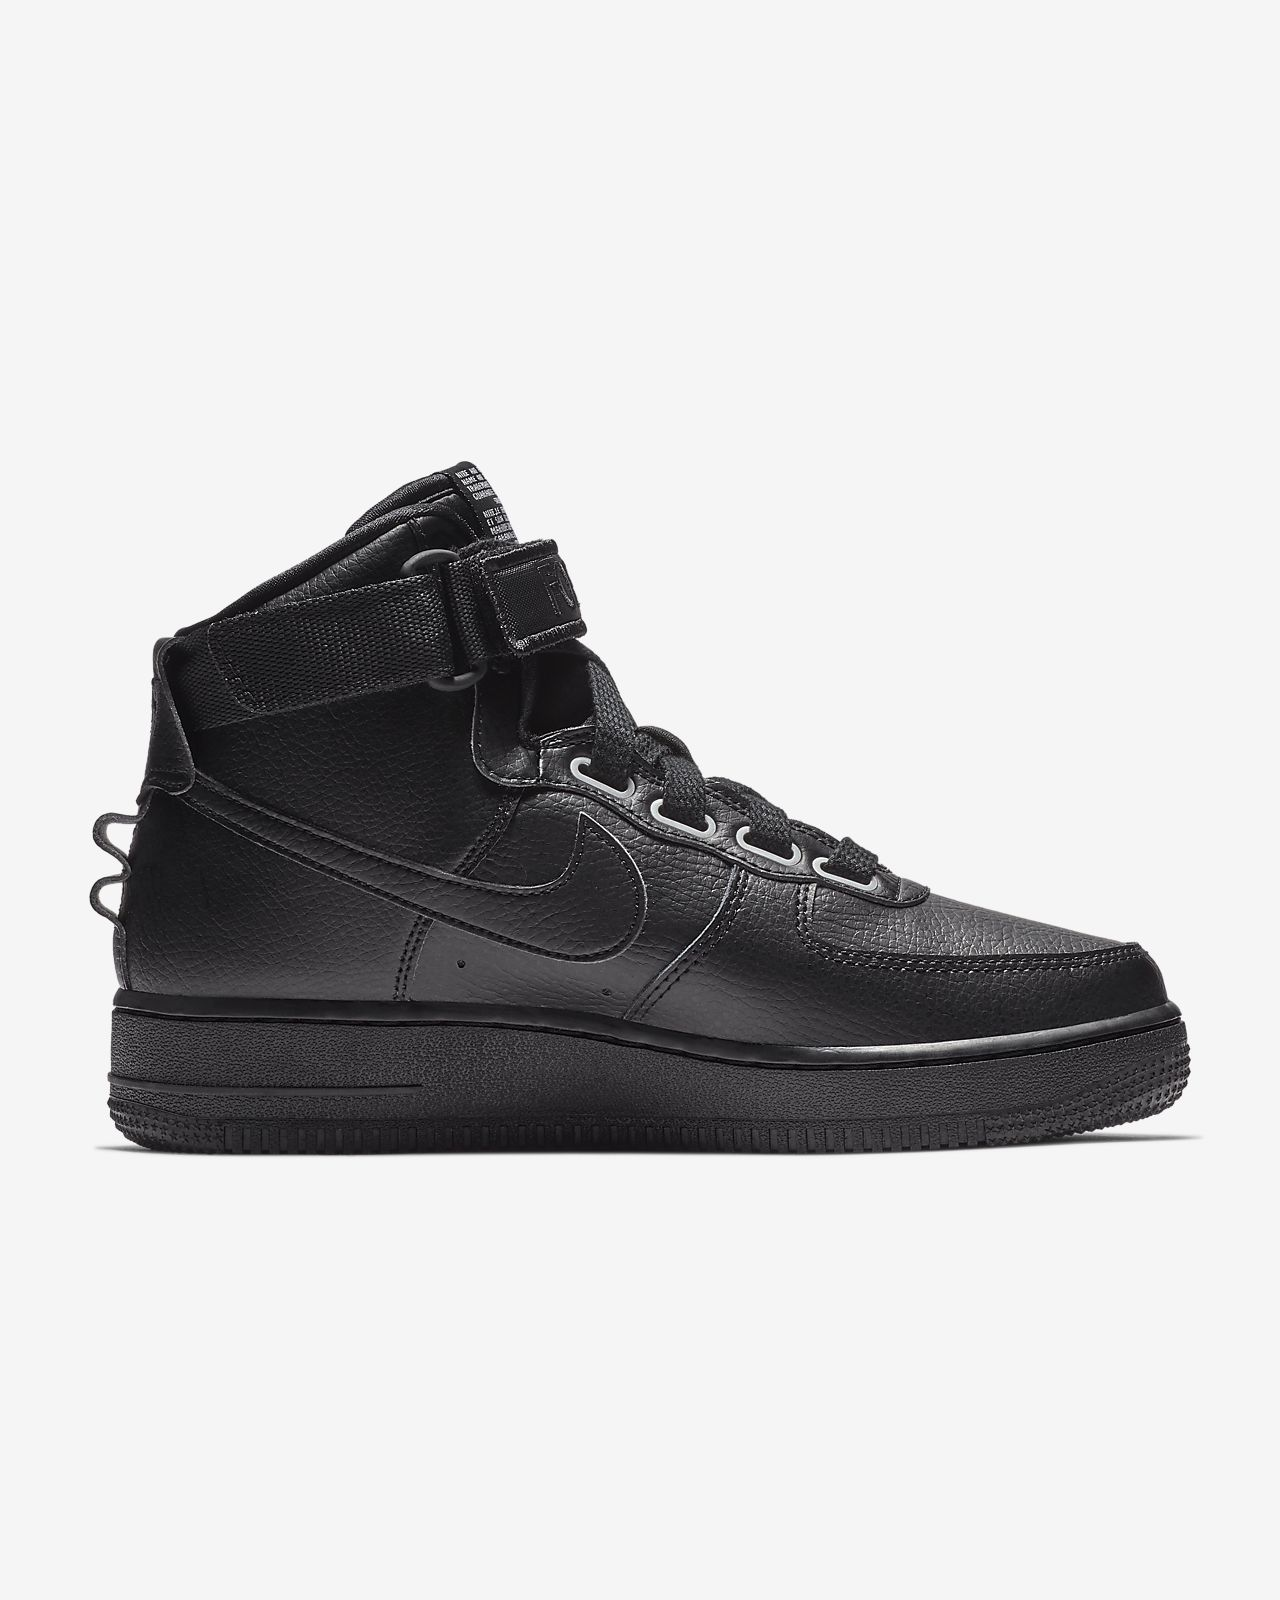 94ae26260d32 Nike Air Force 1 High Utility Women s Shoe. Nike.com